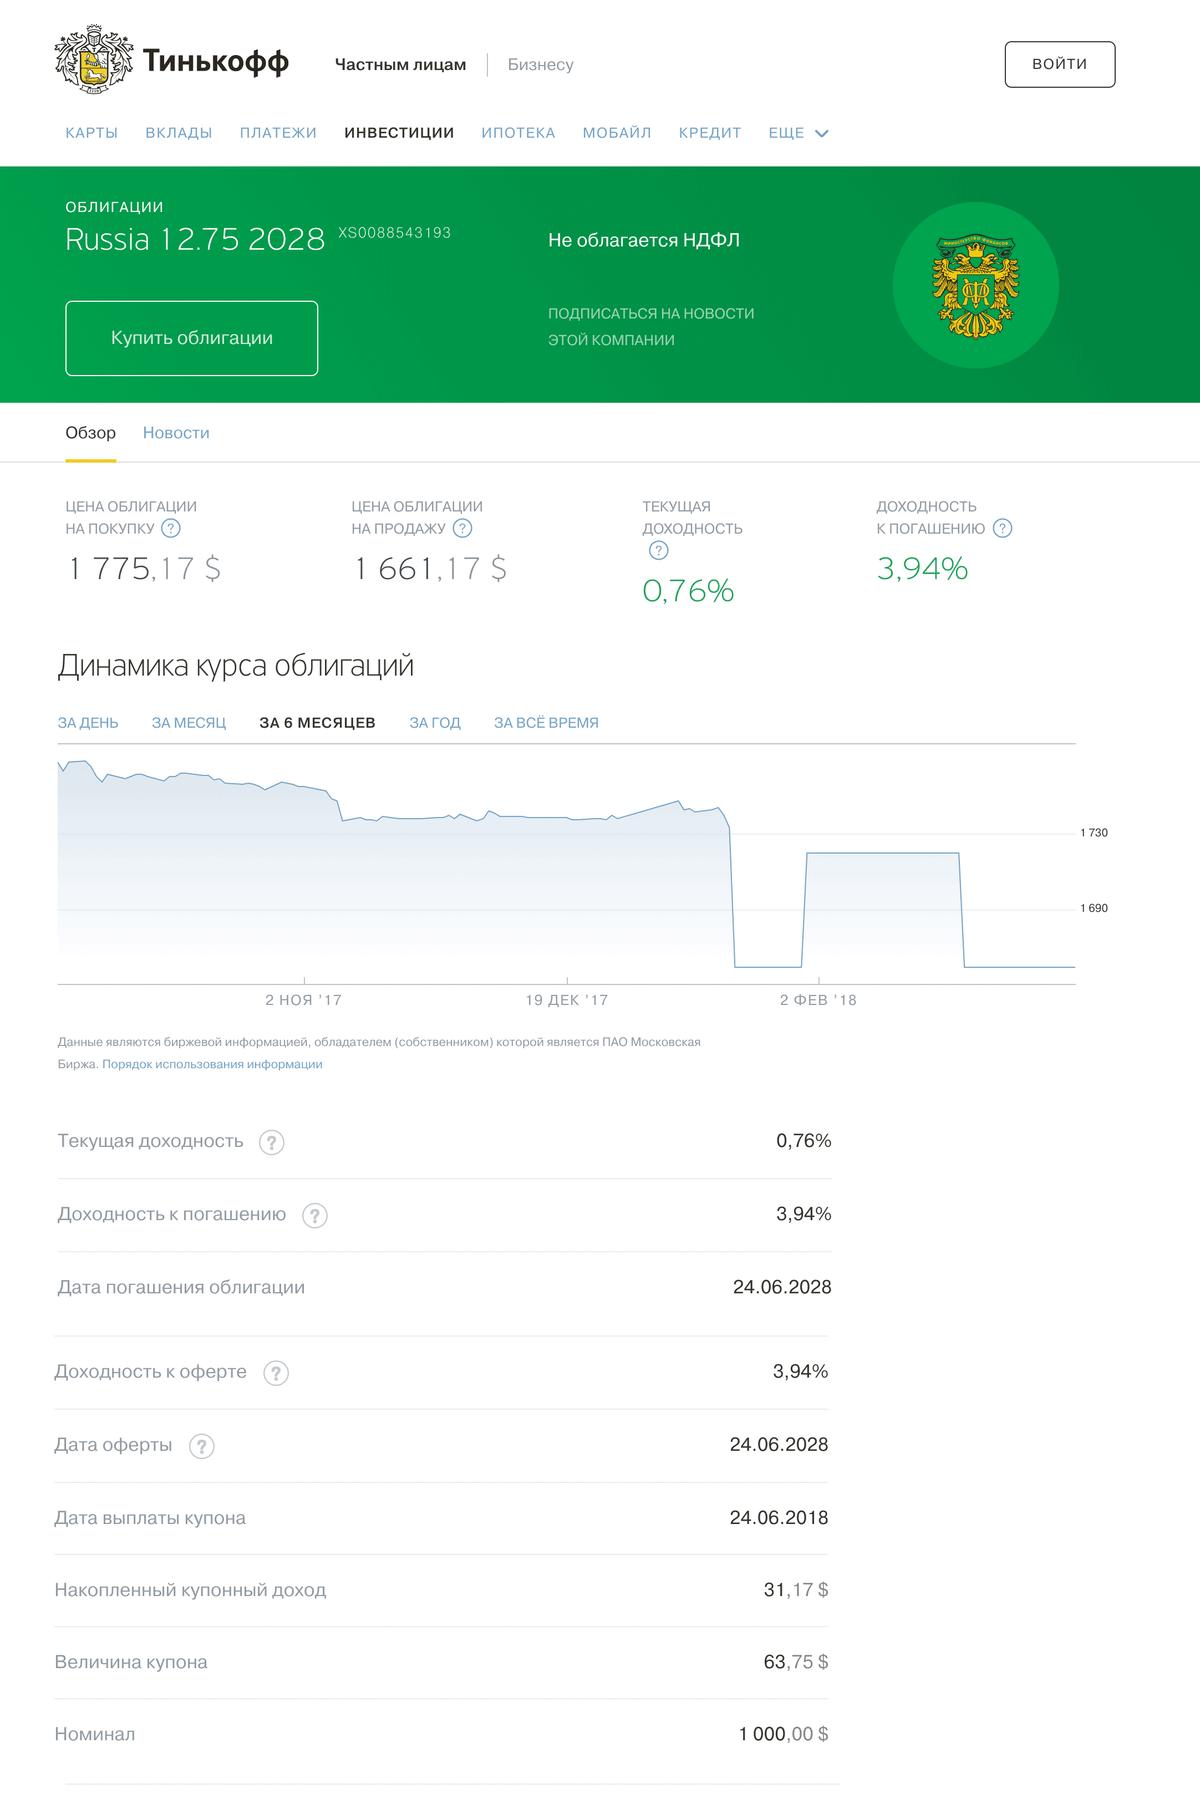 Валютная облигация Минфина XS0088543193 в Тинькофф-инвестициях